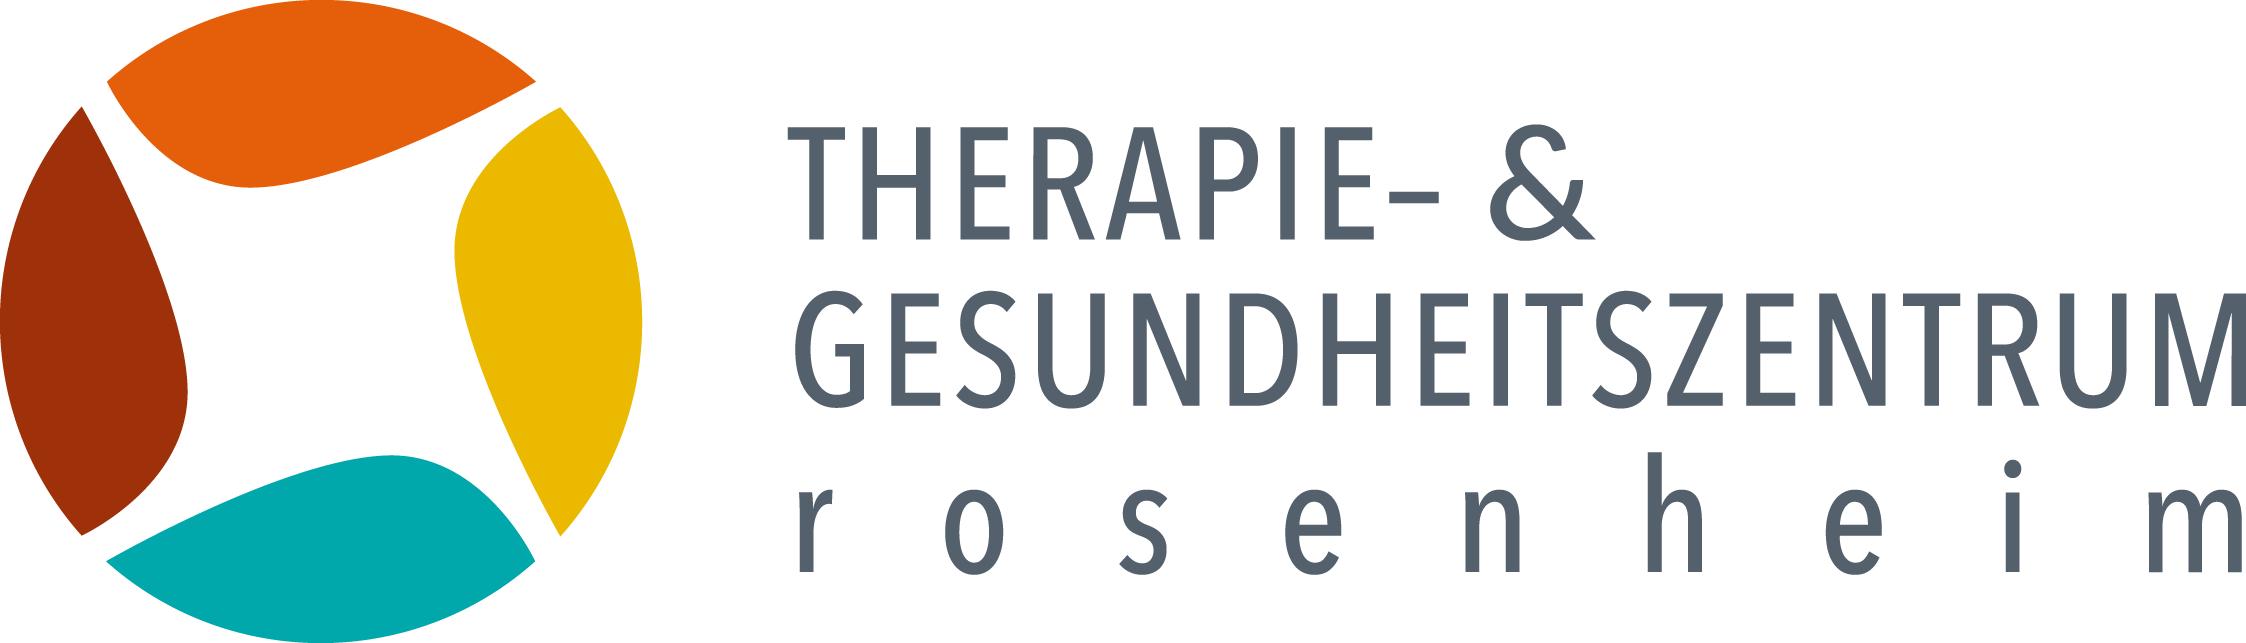 tgz-rosenheim-logo